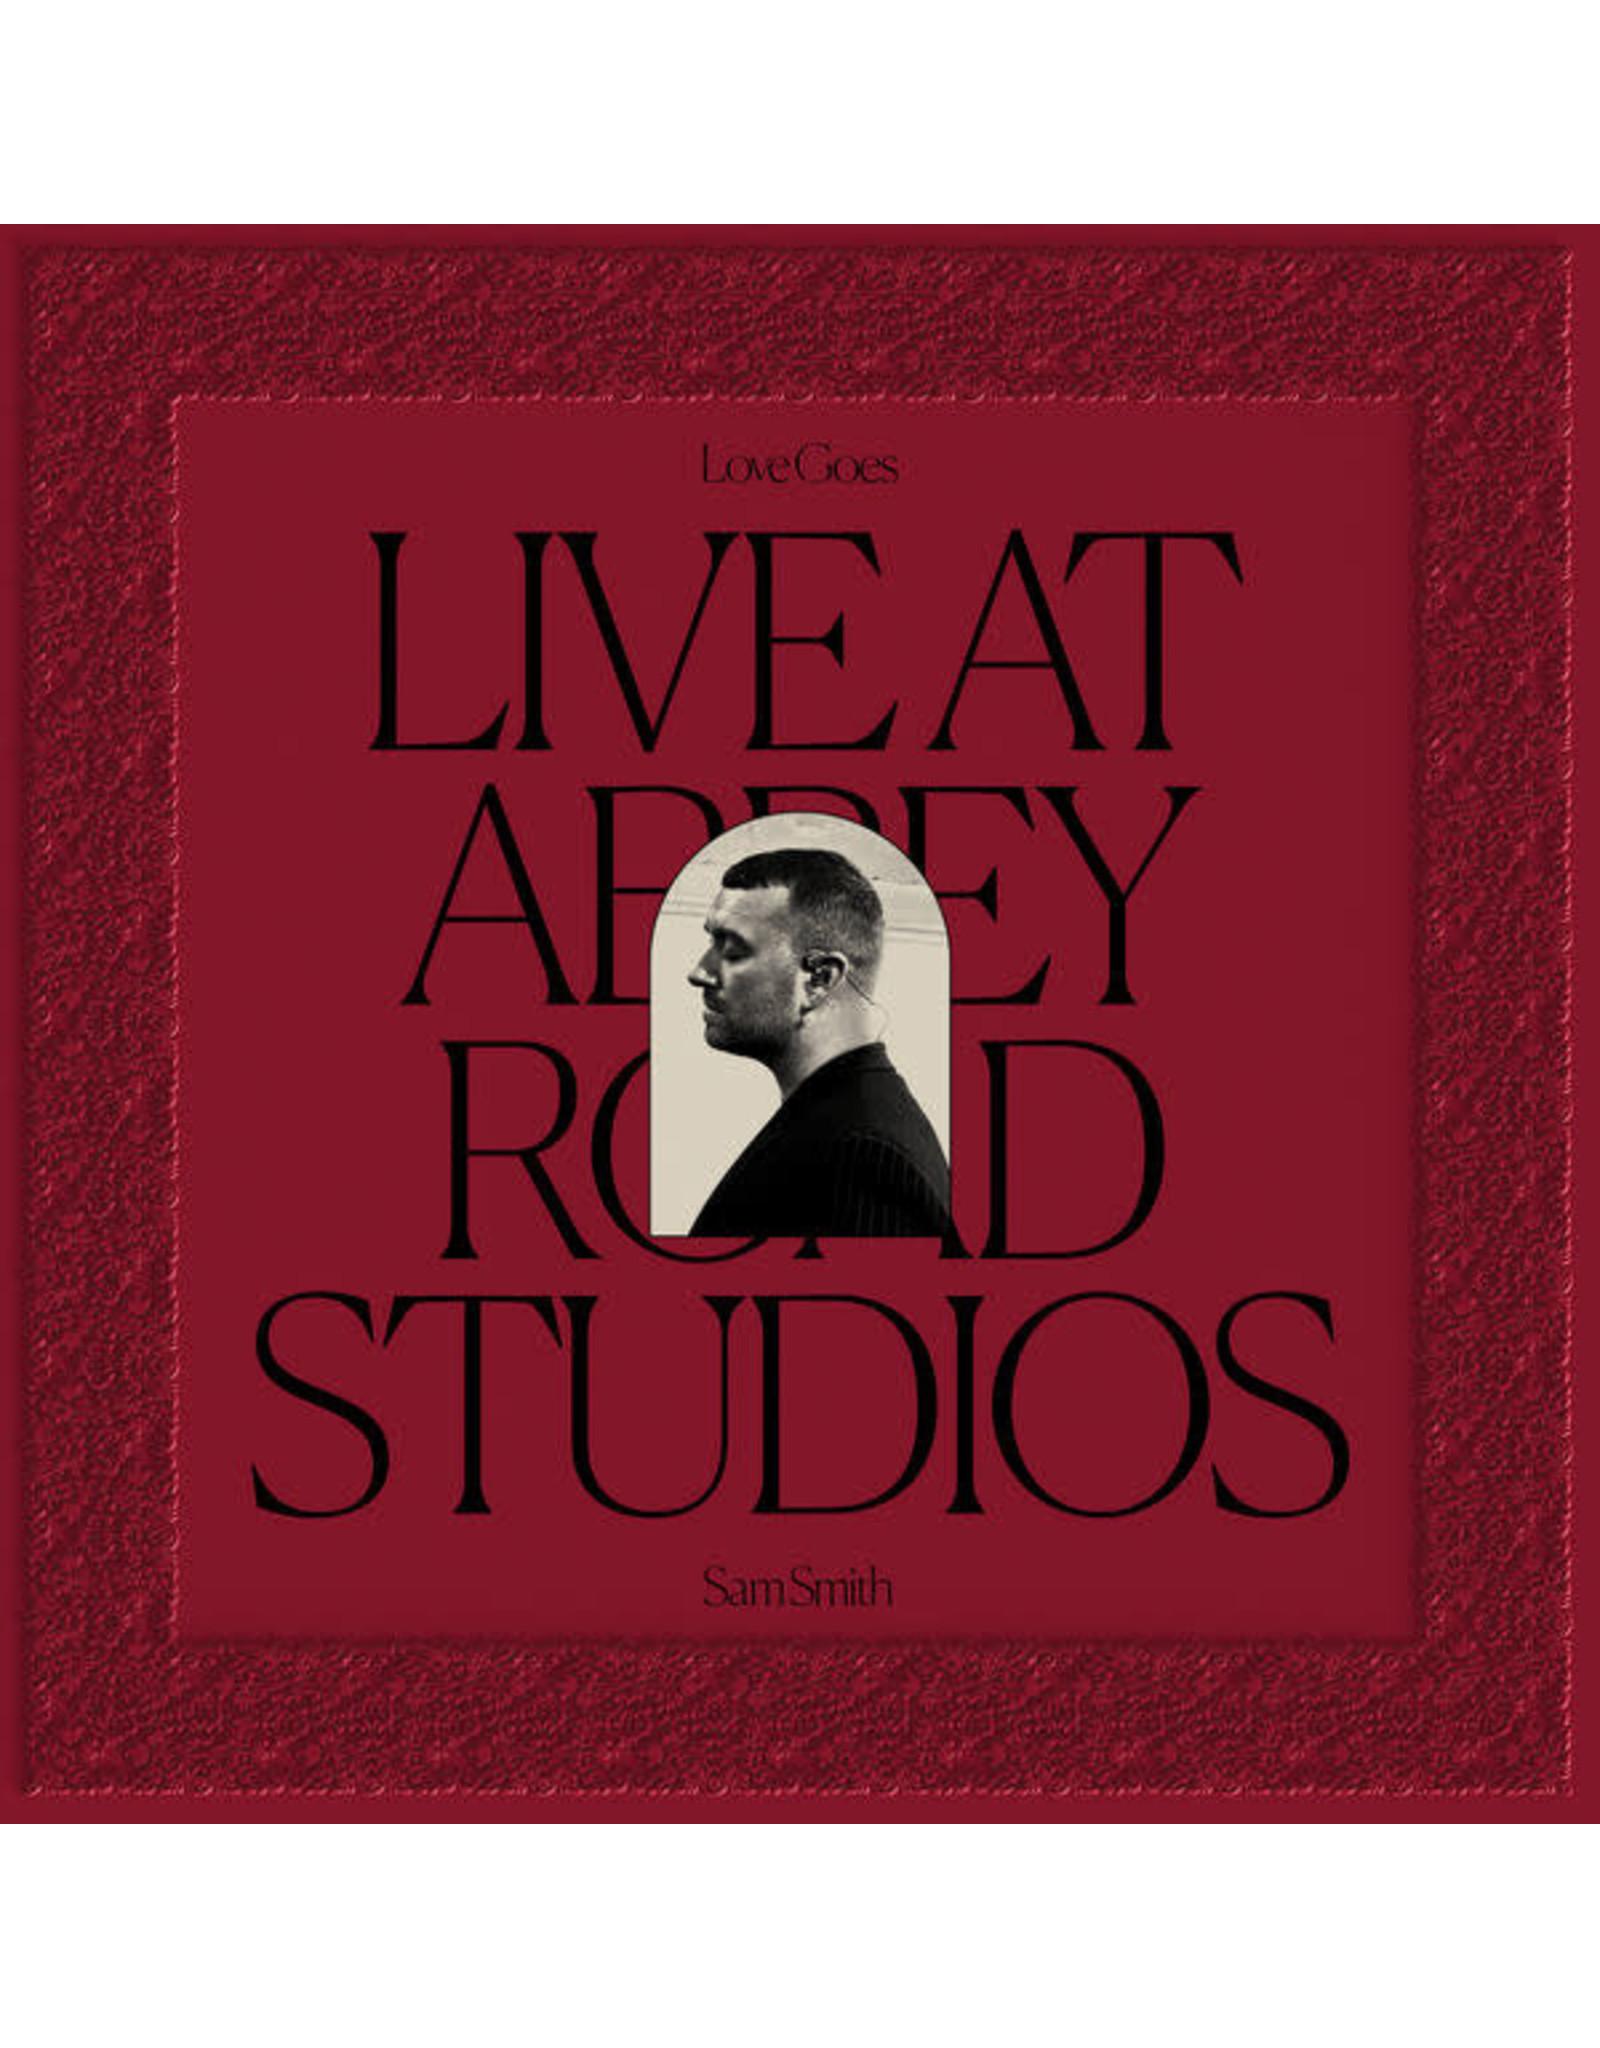 Smith, Sam - Live at Abbey Road Studios LP